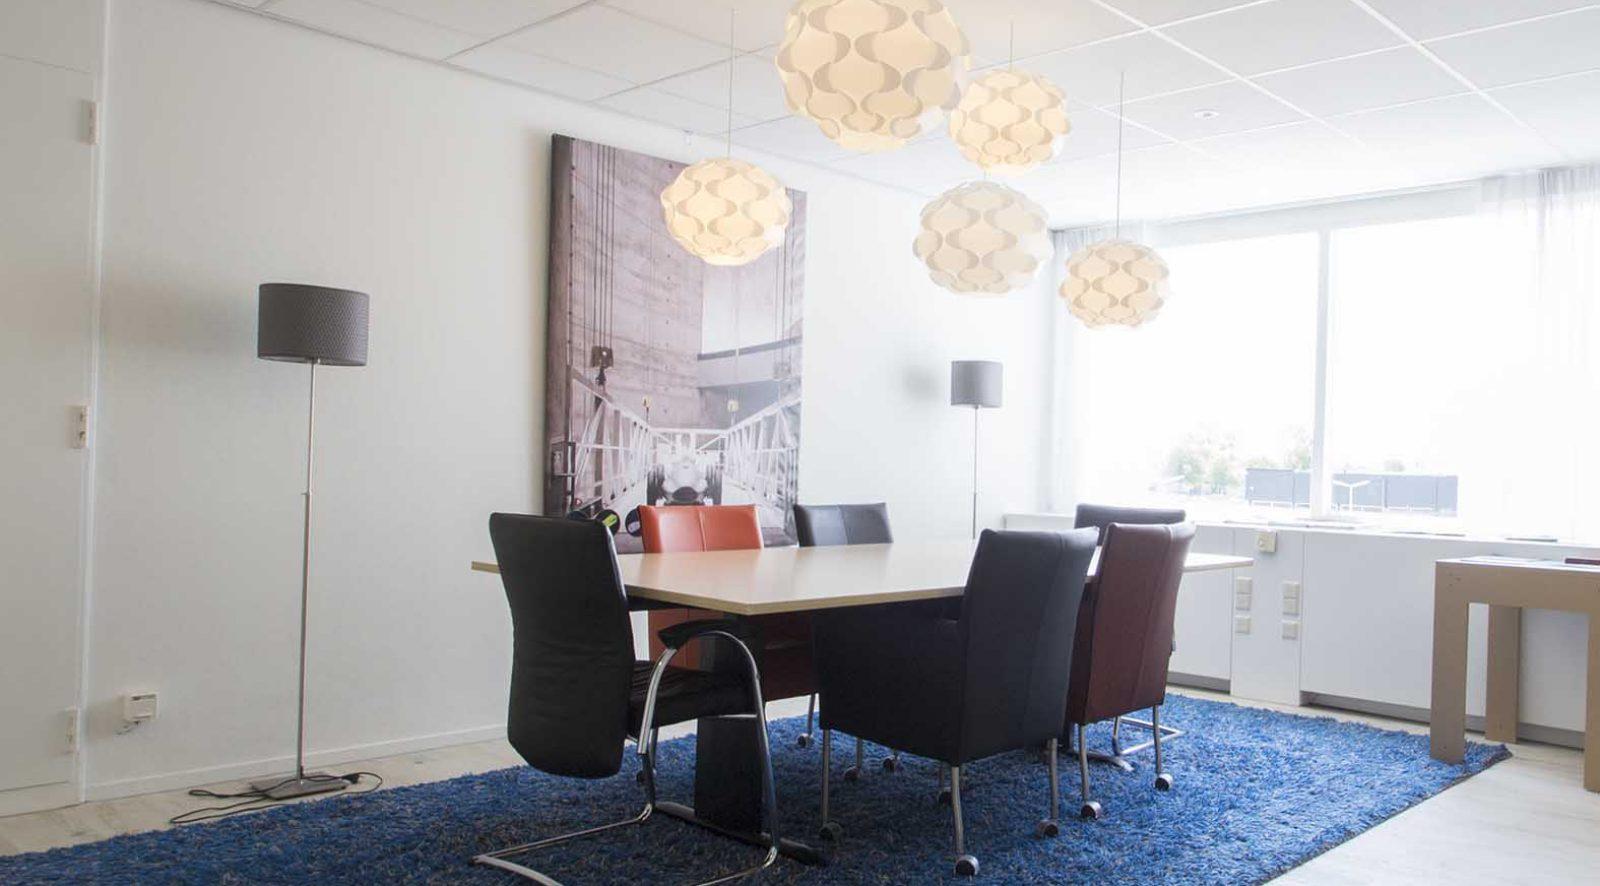 Bedrijfsruimte huren Haarlem | Crown Business Center Haarlem